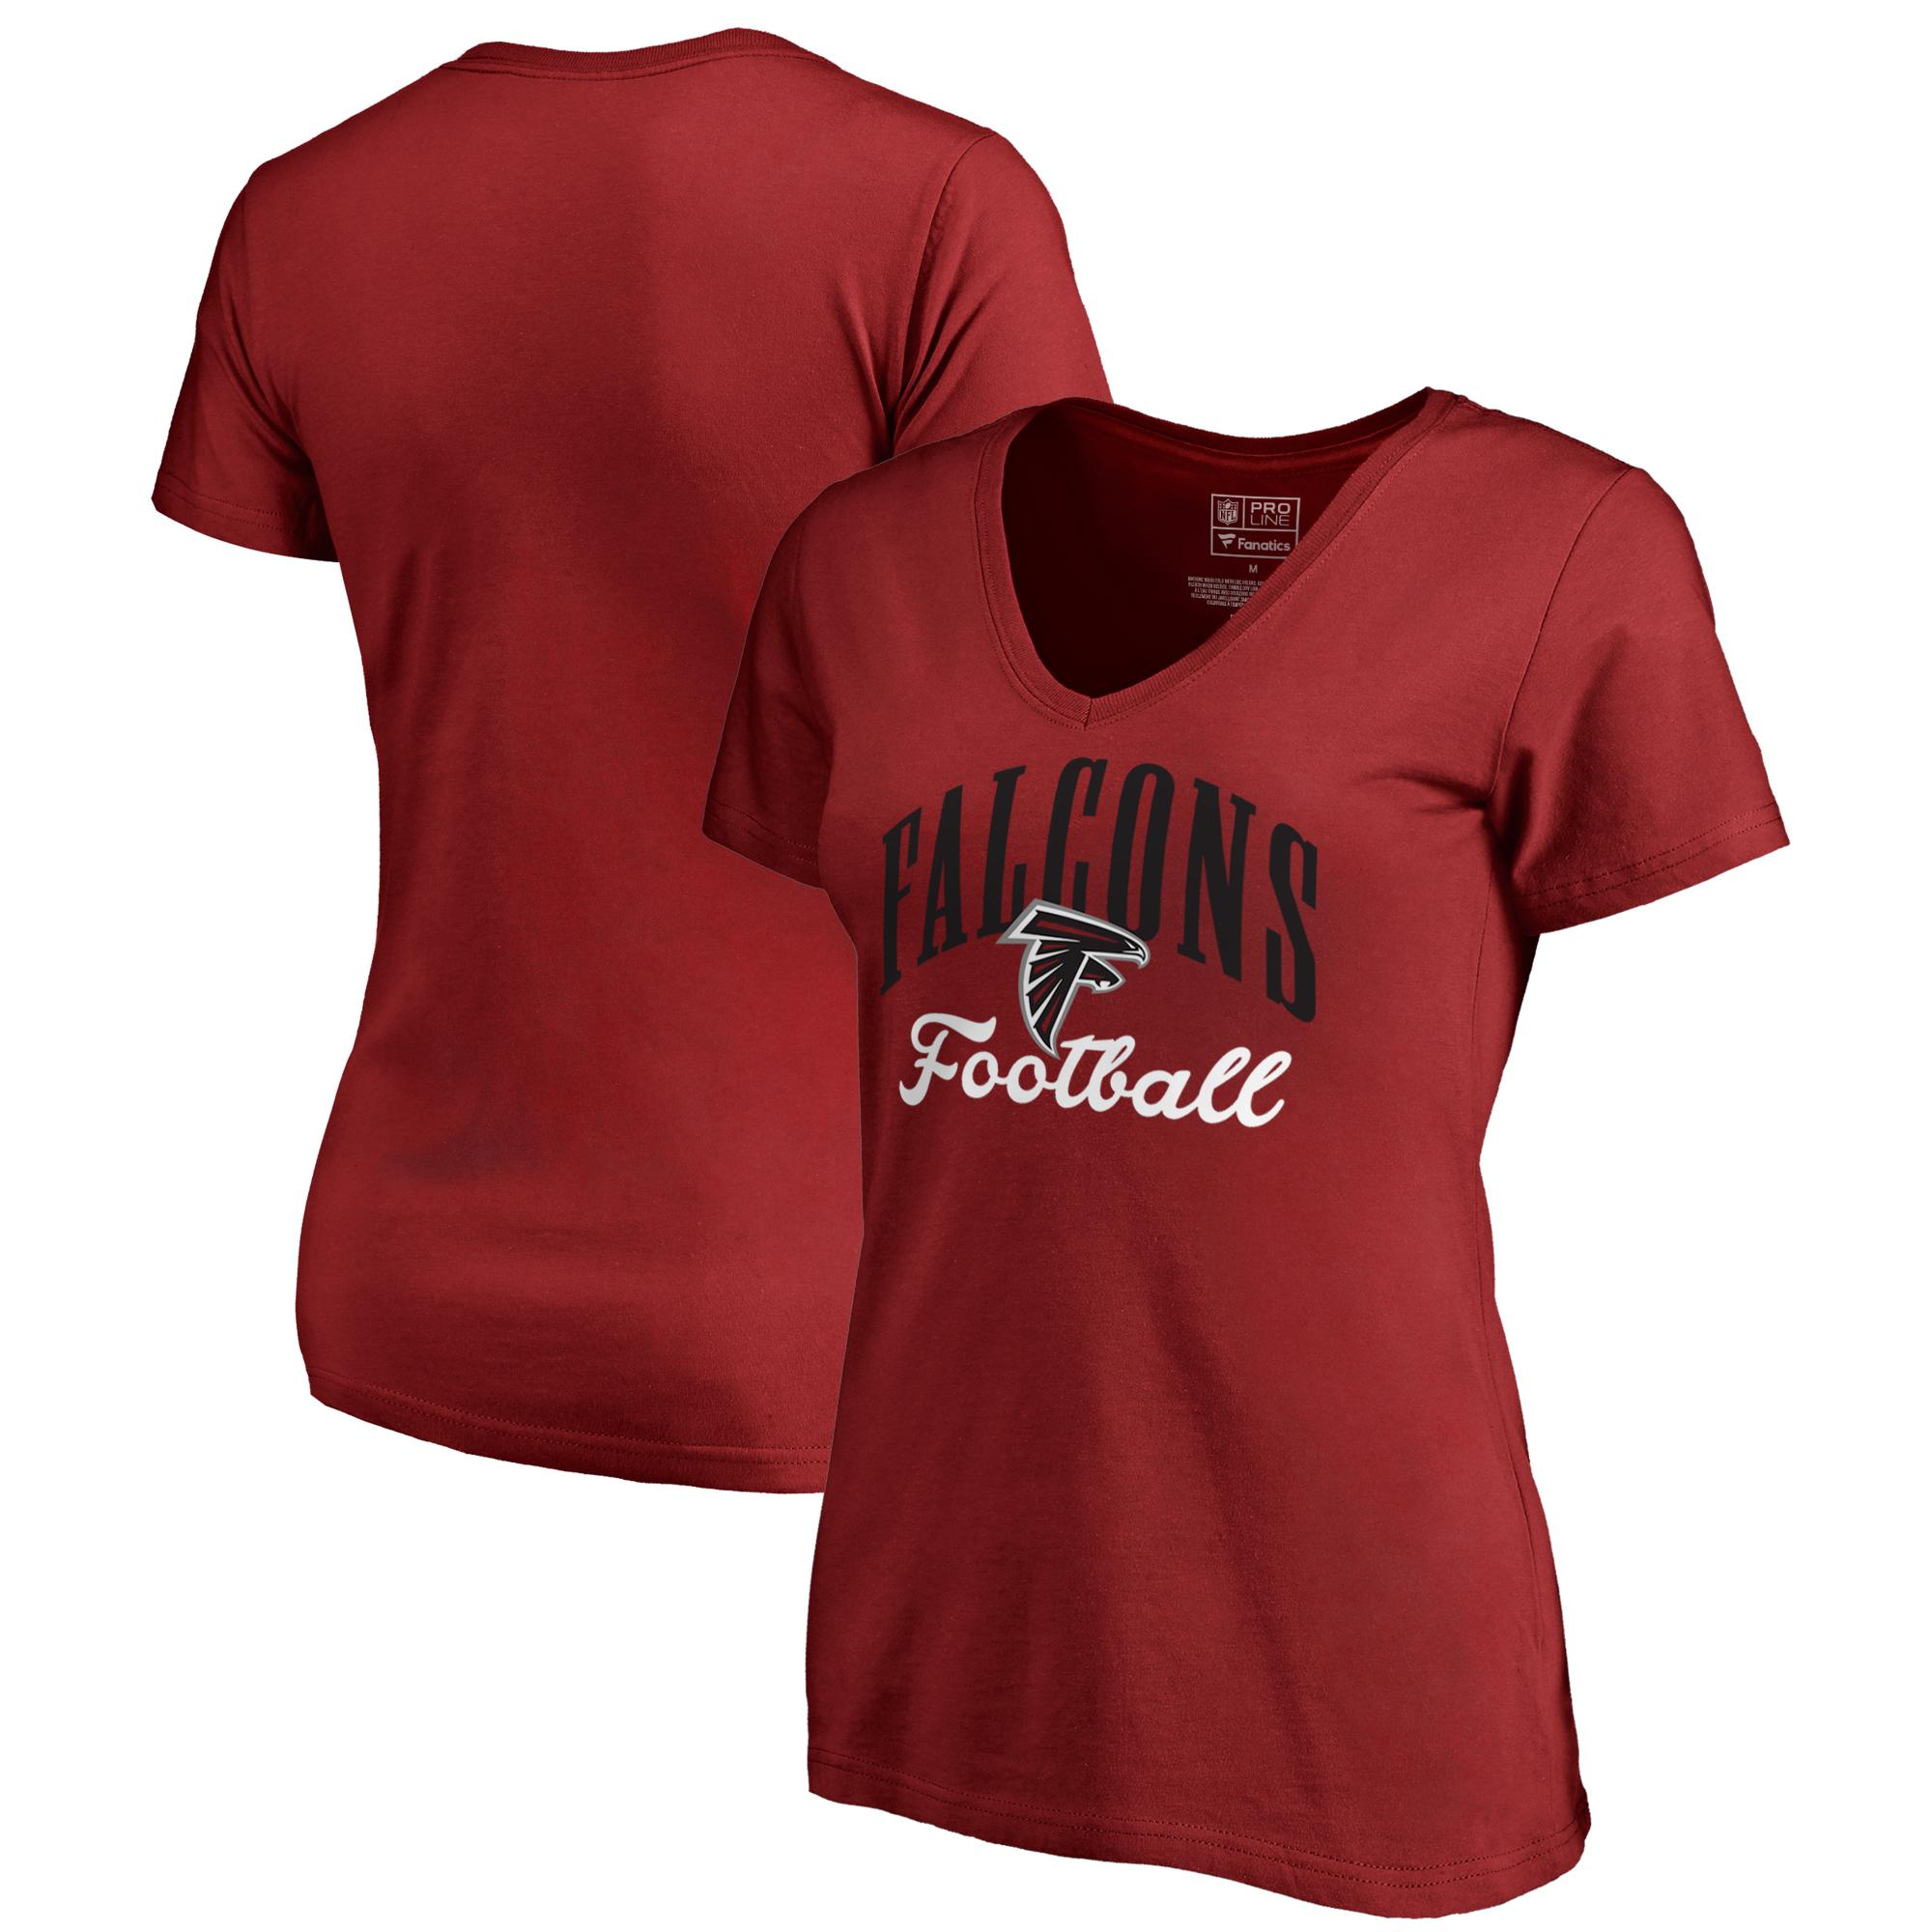 Atlanta Falcons NFL Pro Line by Fanatics Branded Women's Victory Script V-Neck T-Shirt -Red